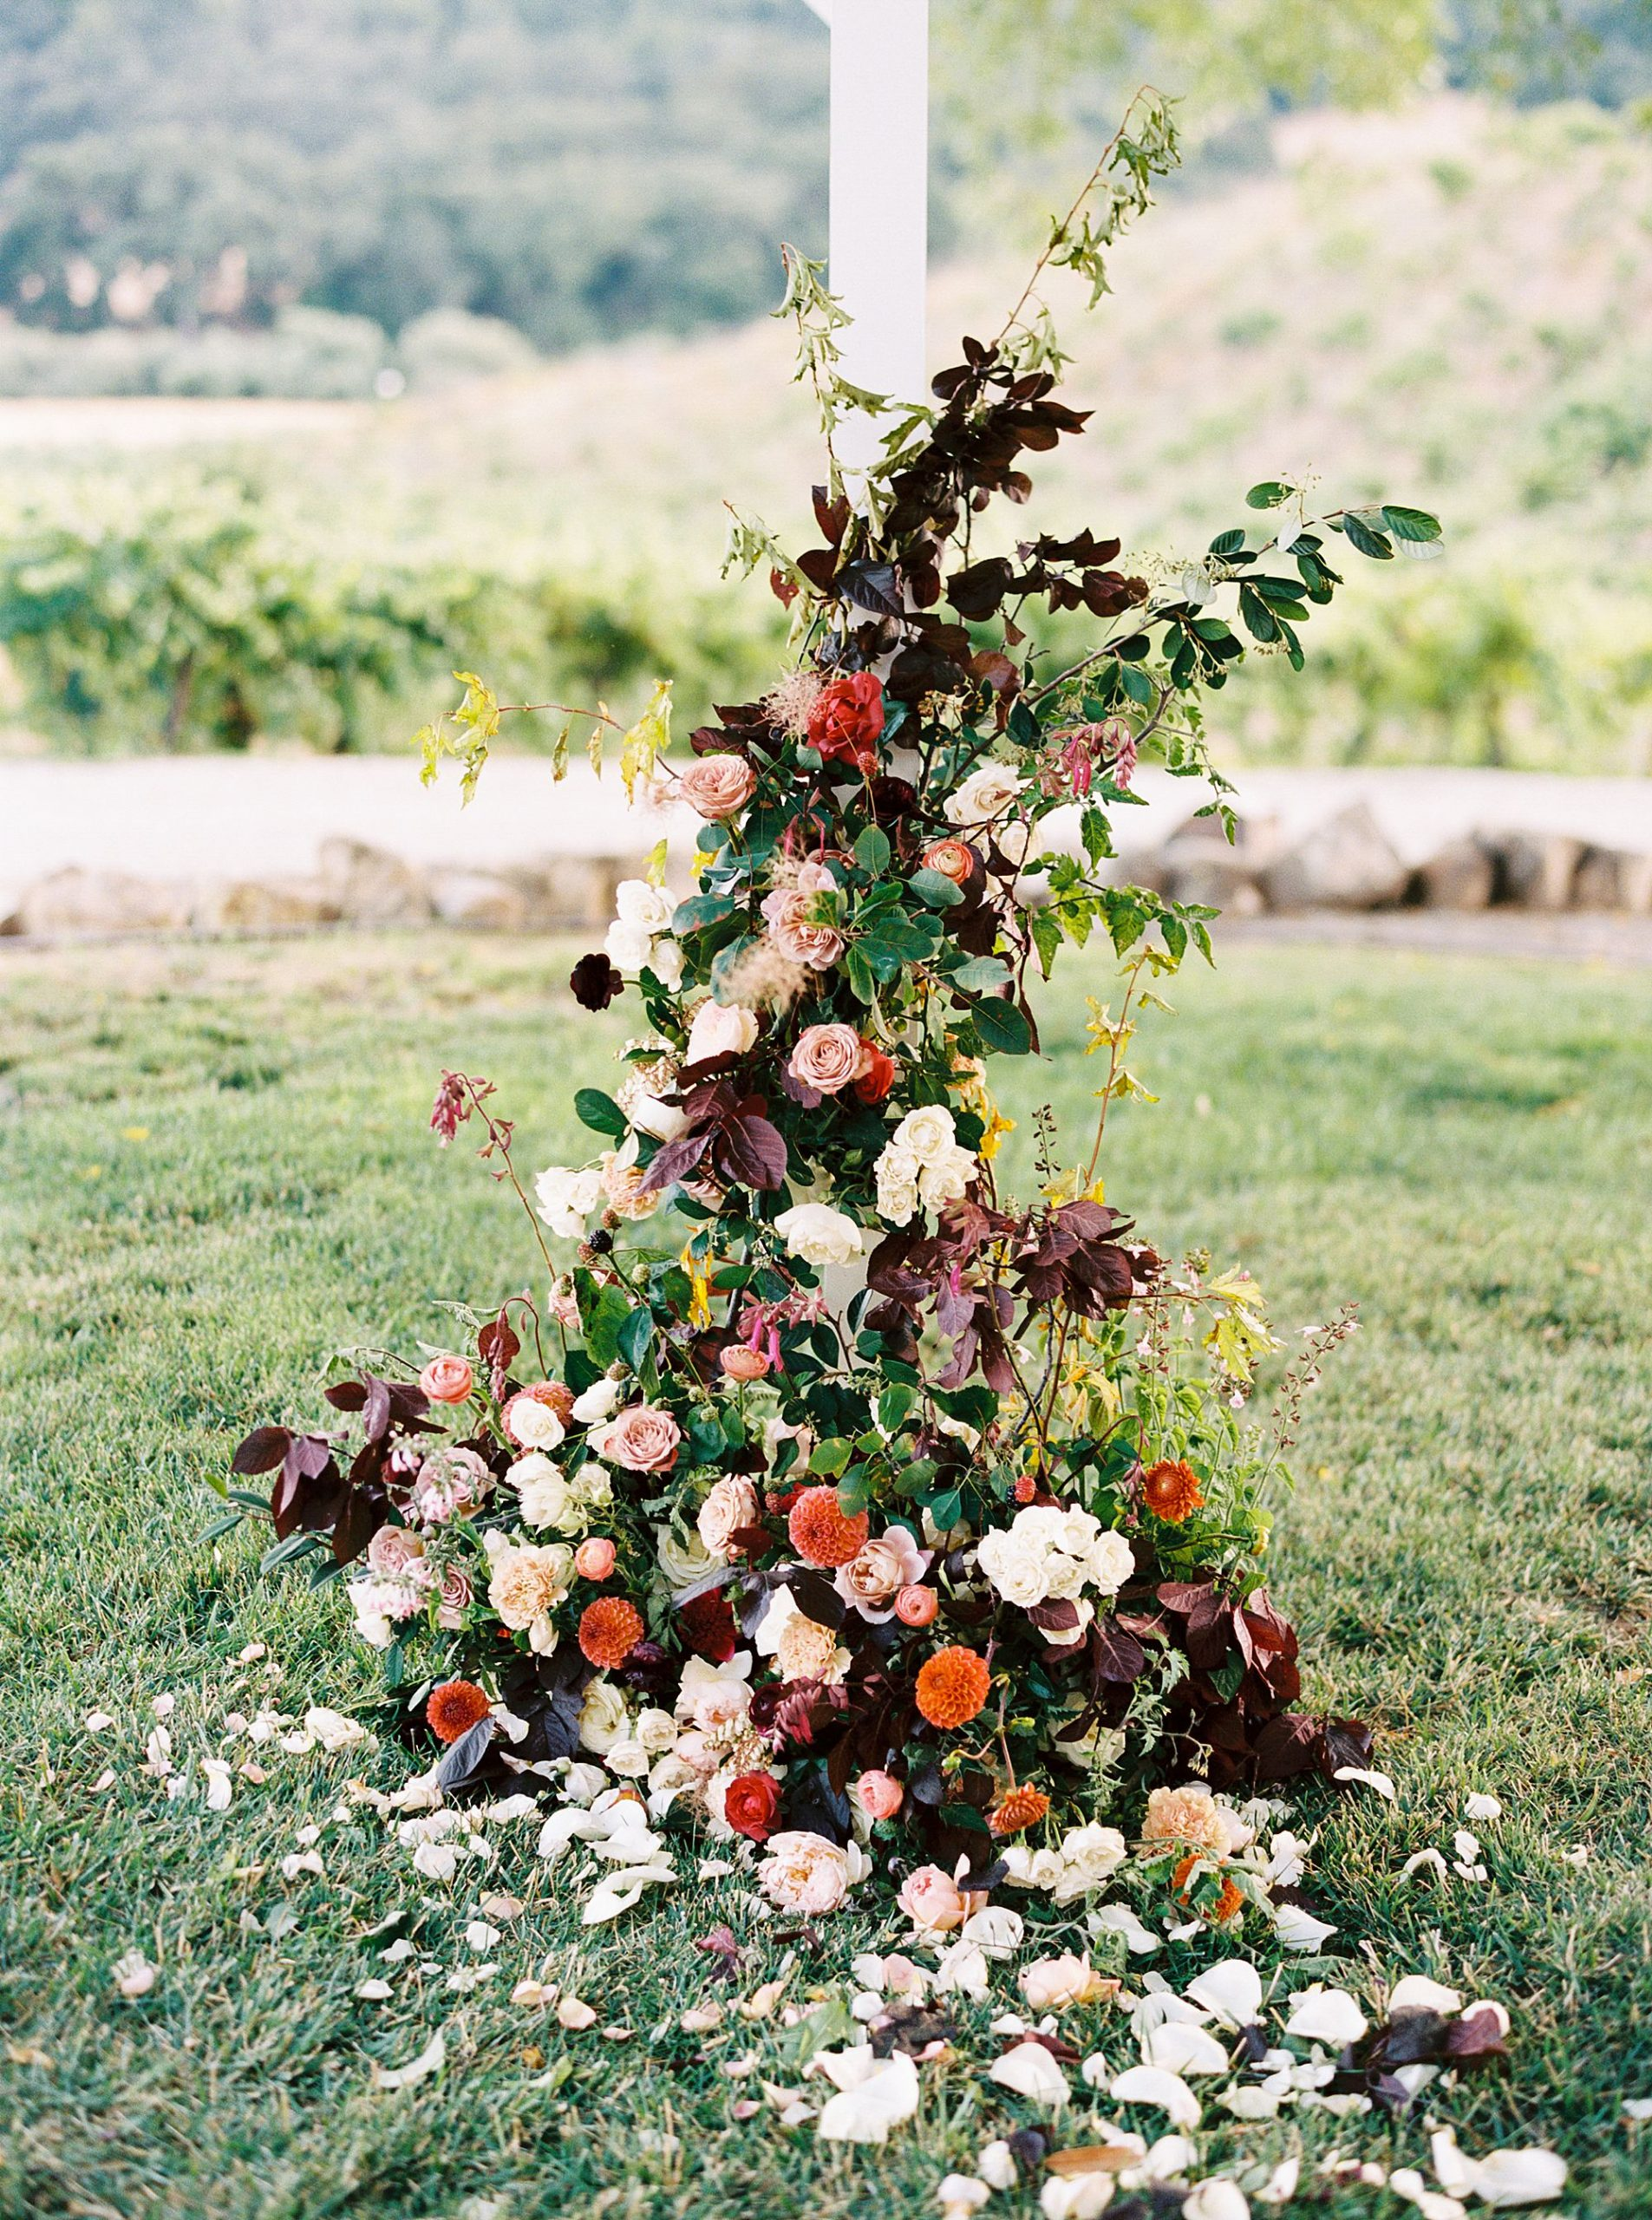 HammerSky Wedding Inspiration Featured on Hey Wedding Lady with Vanessa Noel Events - Ashley Baumgartner - SLO Wedding Photographer_0020.jpg